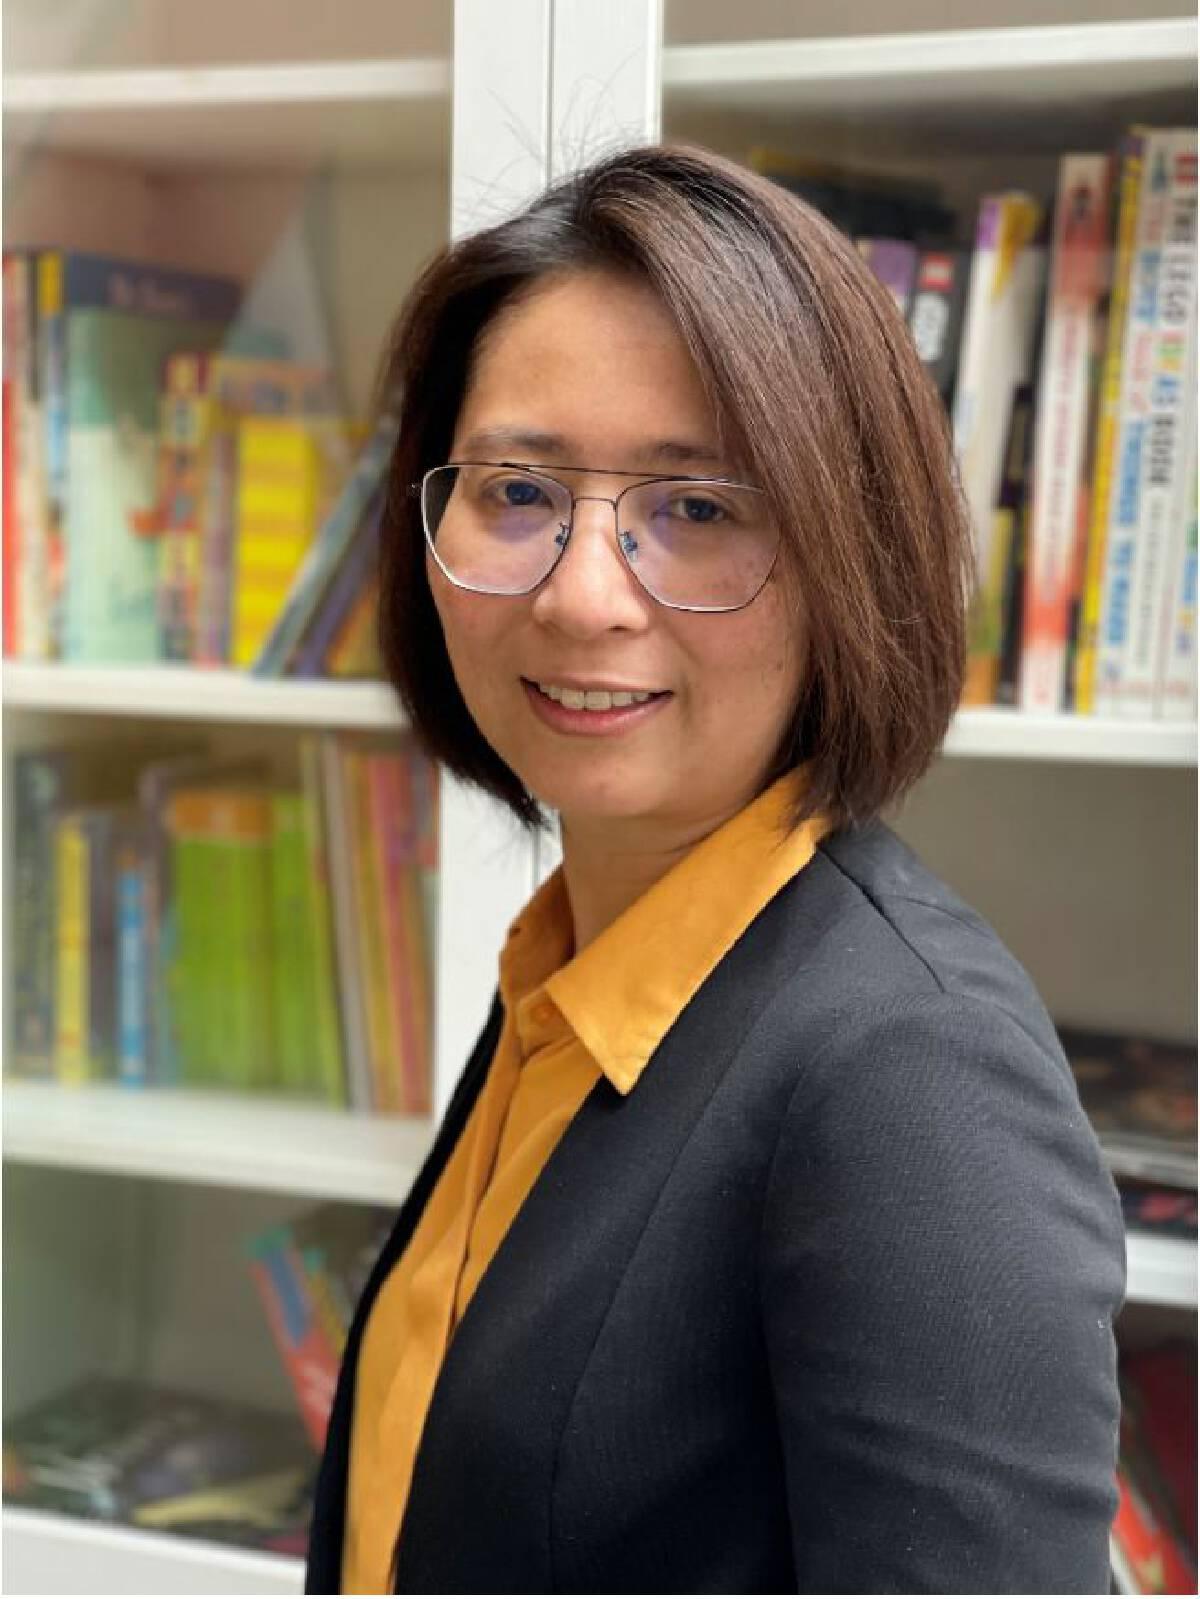 Sansanee Lerdlitruangsin, MD., Medical Director, Roche Thailand